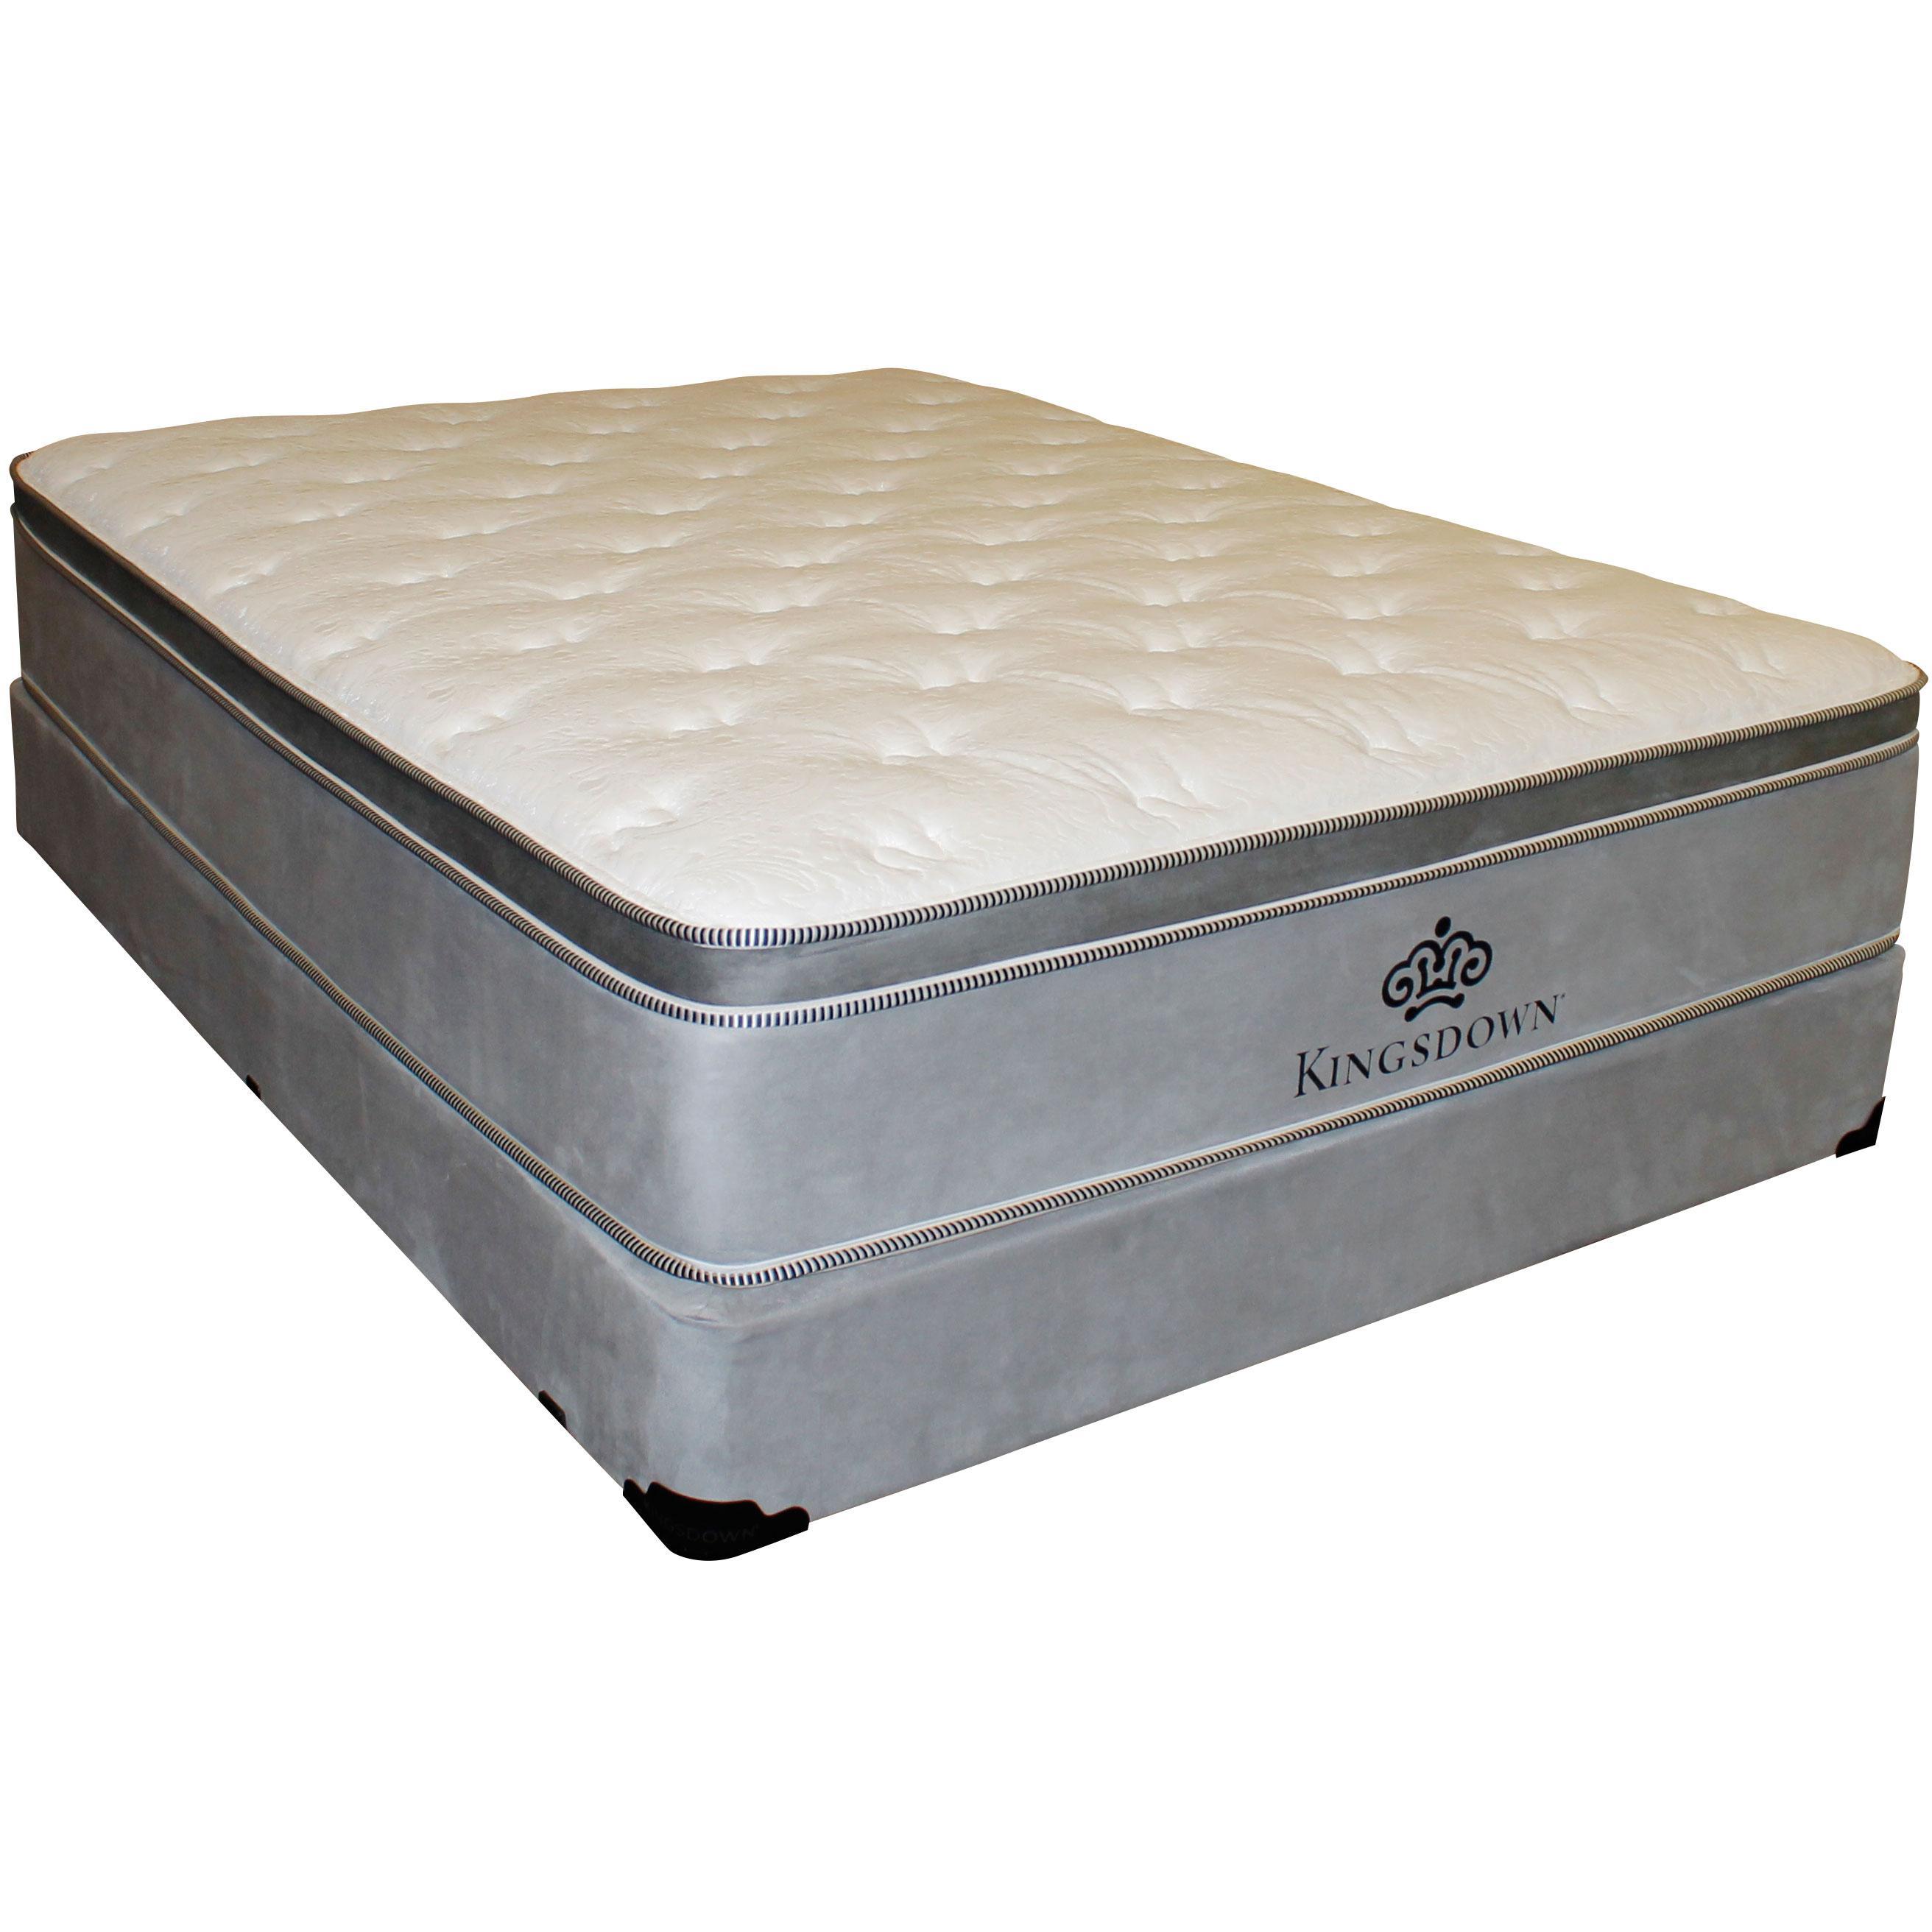 Kingsdown Anniversary Silver King Pillow Top Mattress Set - Item Number: PillowTop-K+2xFoundationK